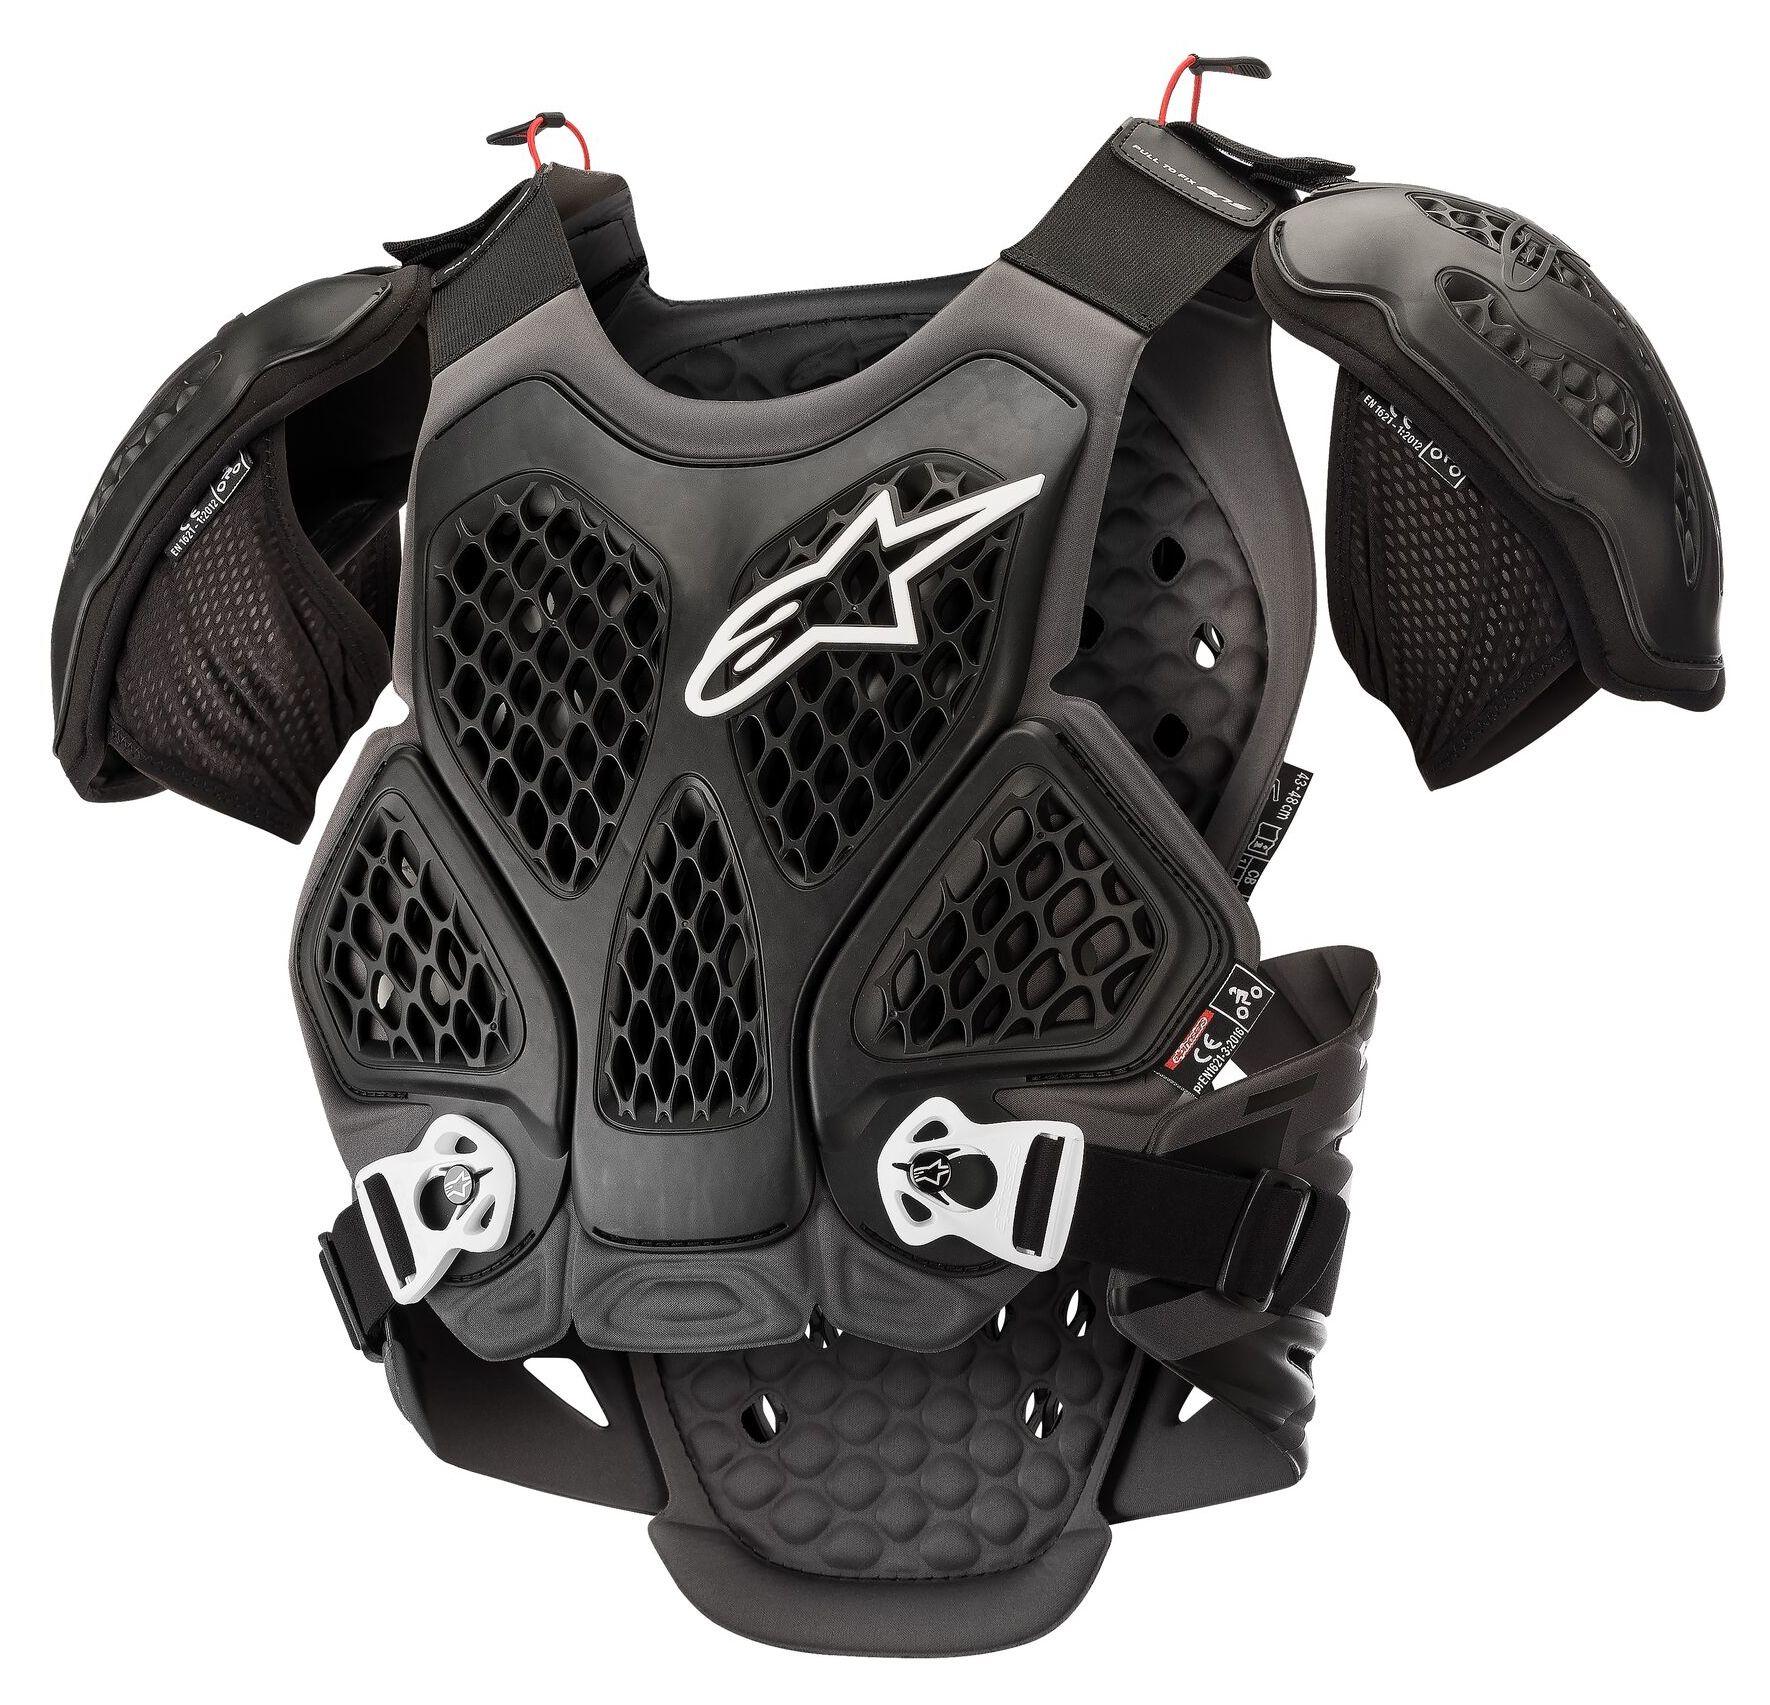 Alpinestars Bionic Chest Protection